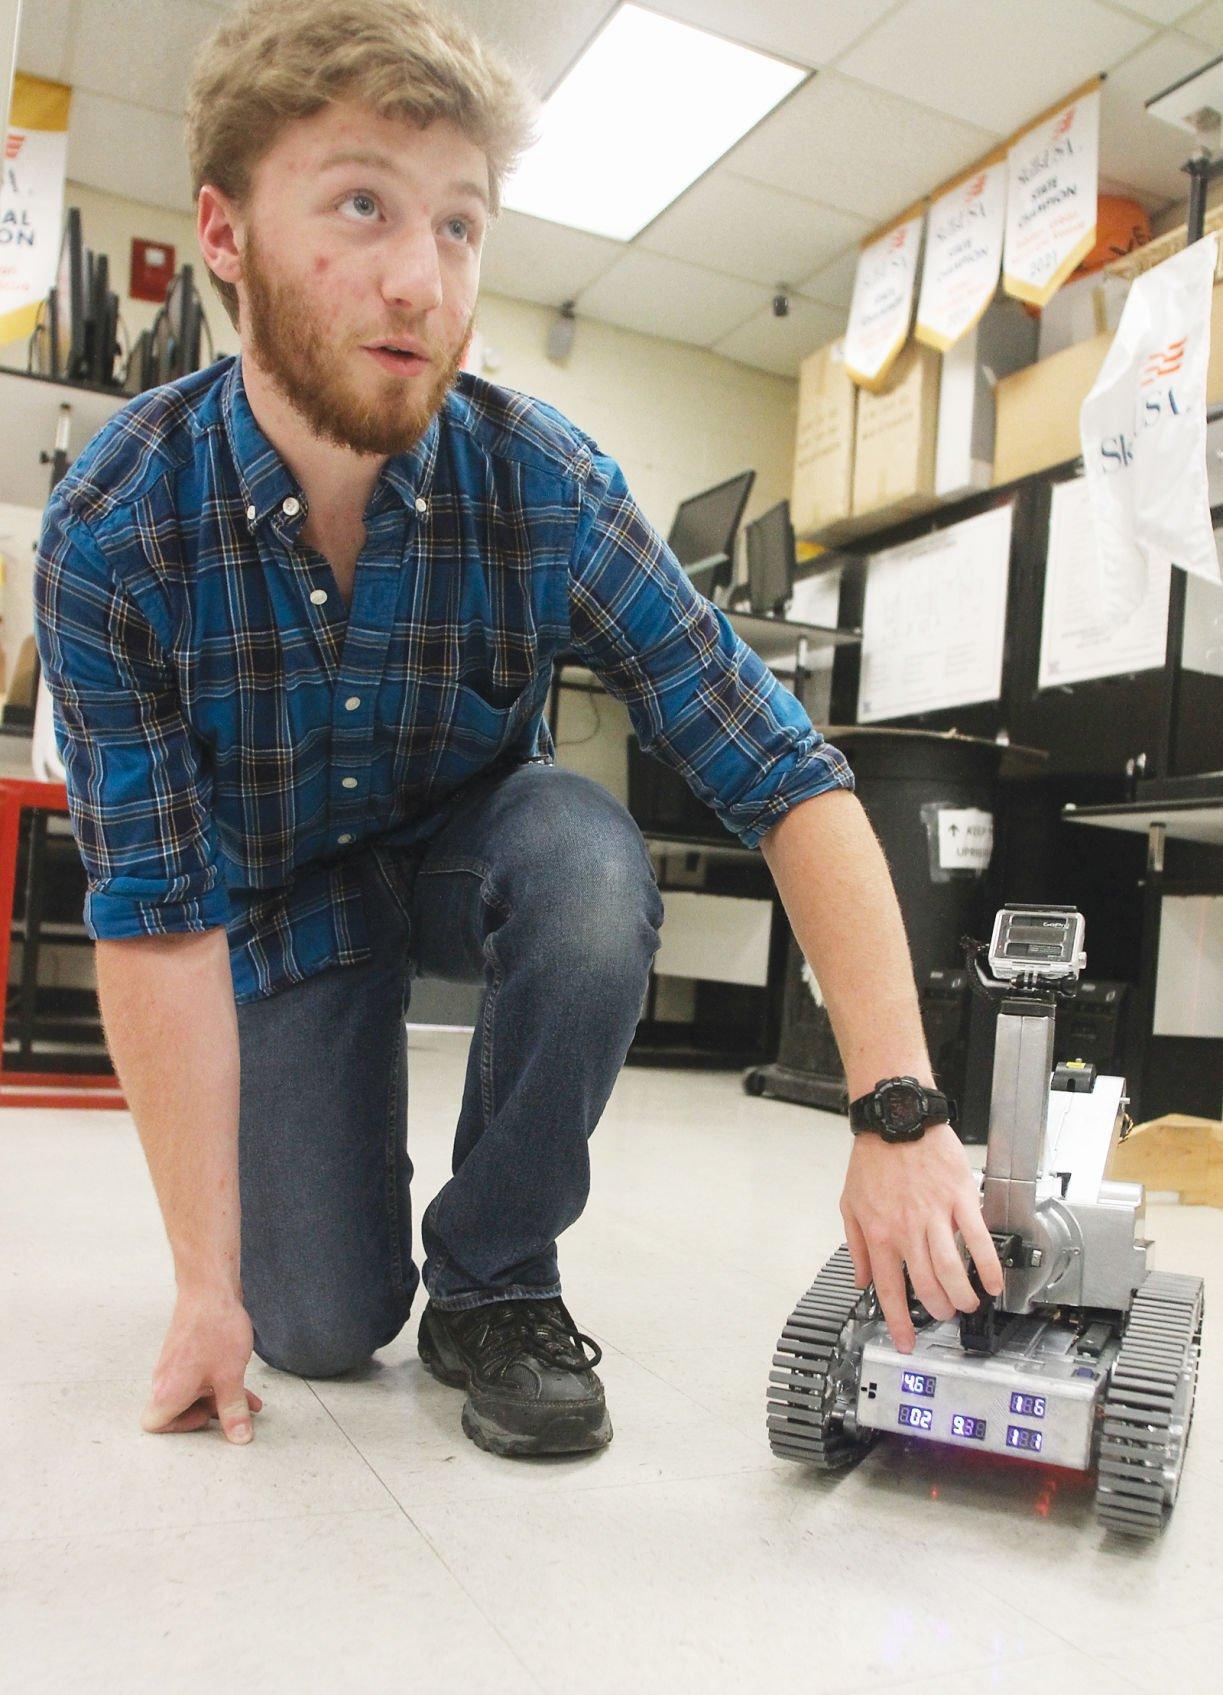 Avery Rayfield shows SkillsUSA robot